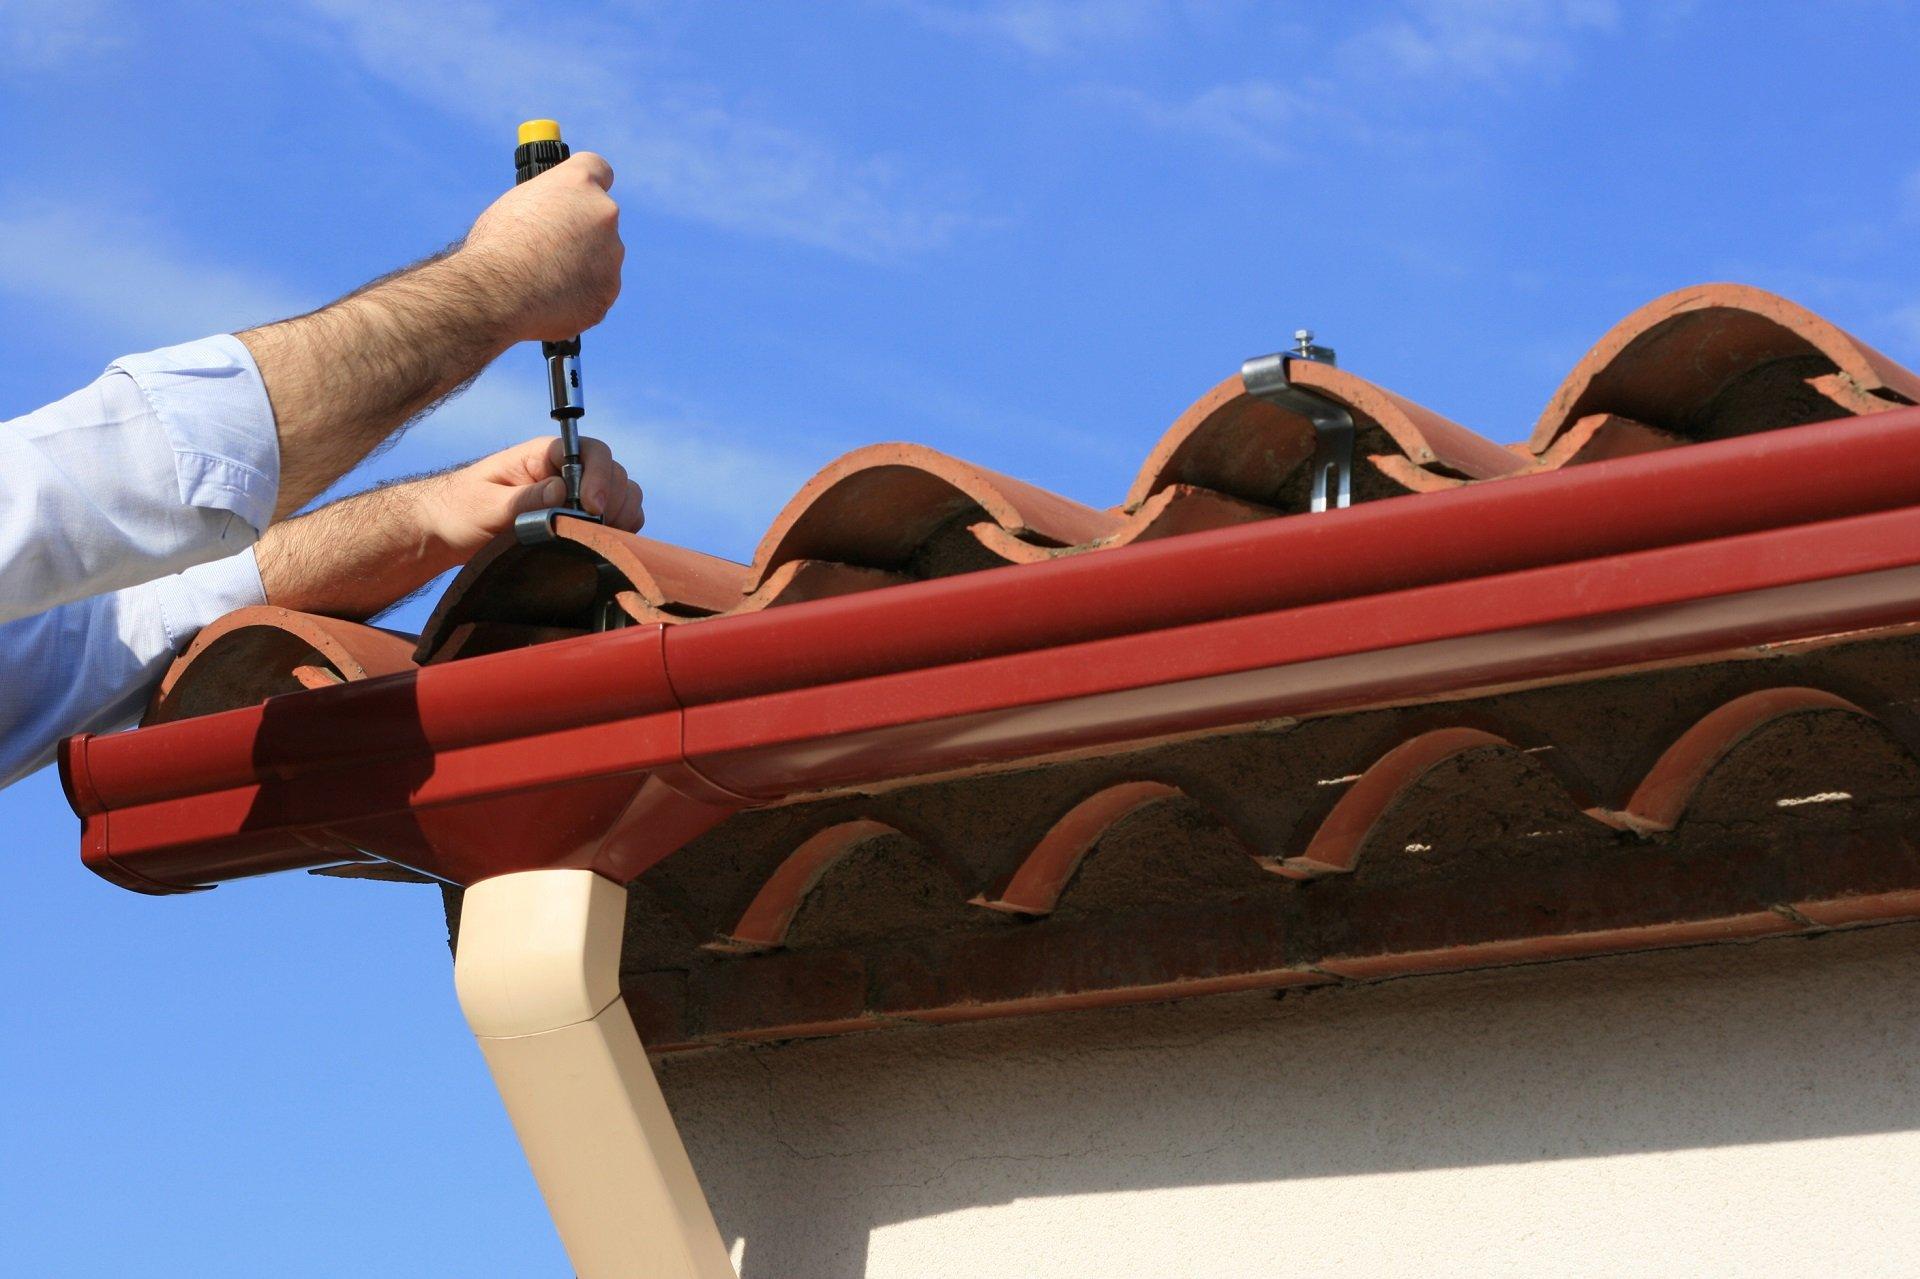 Man installing pvc rain gutter system